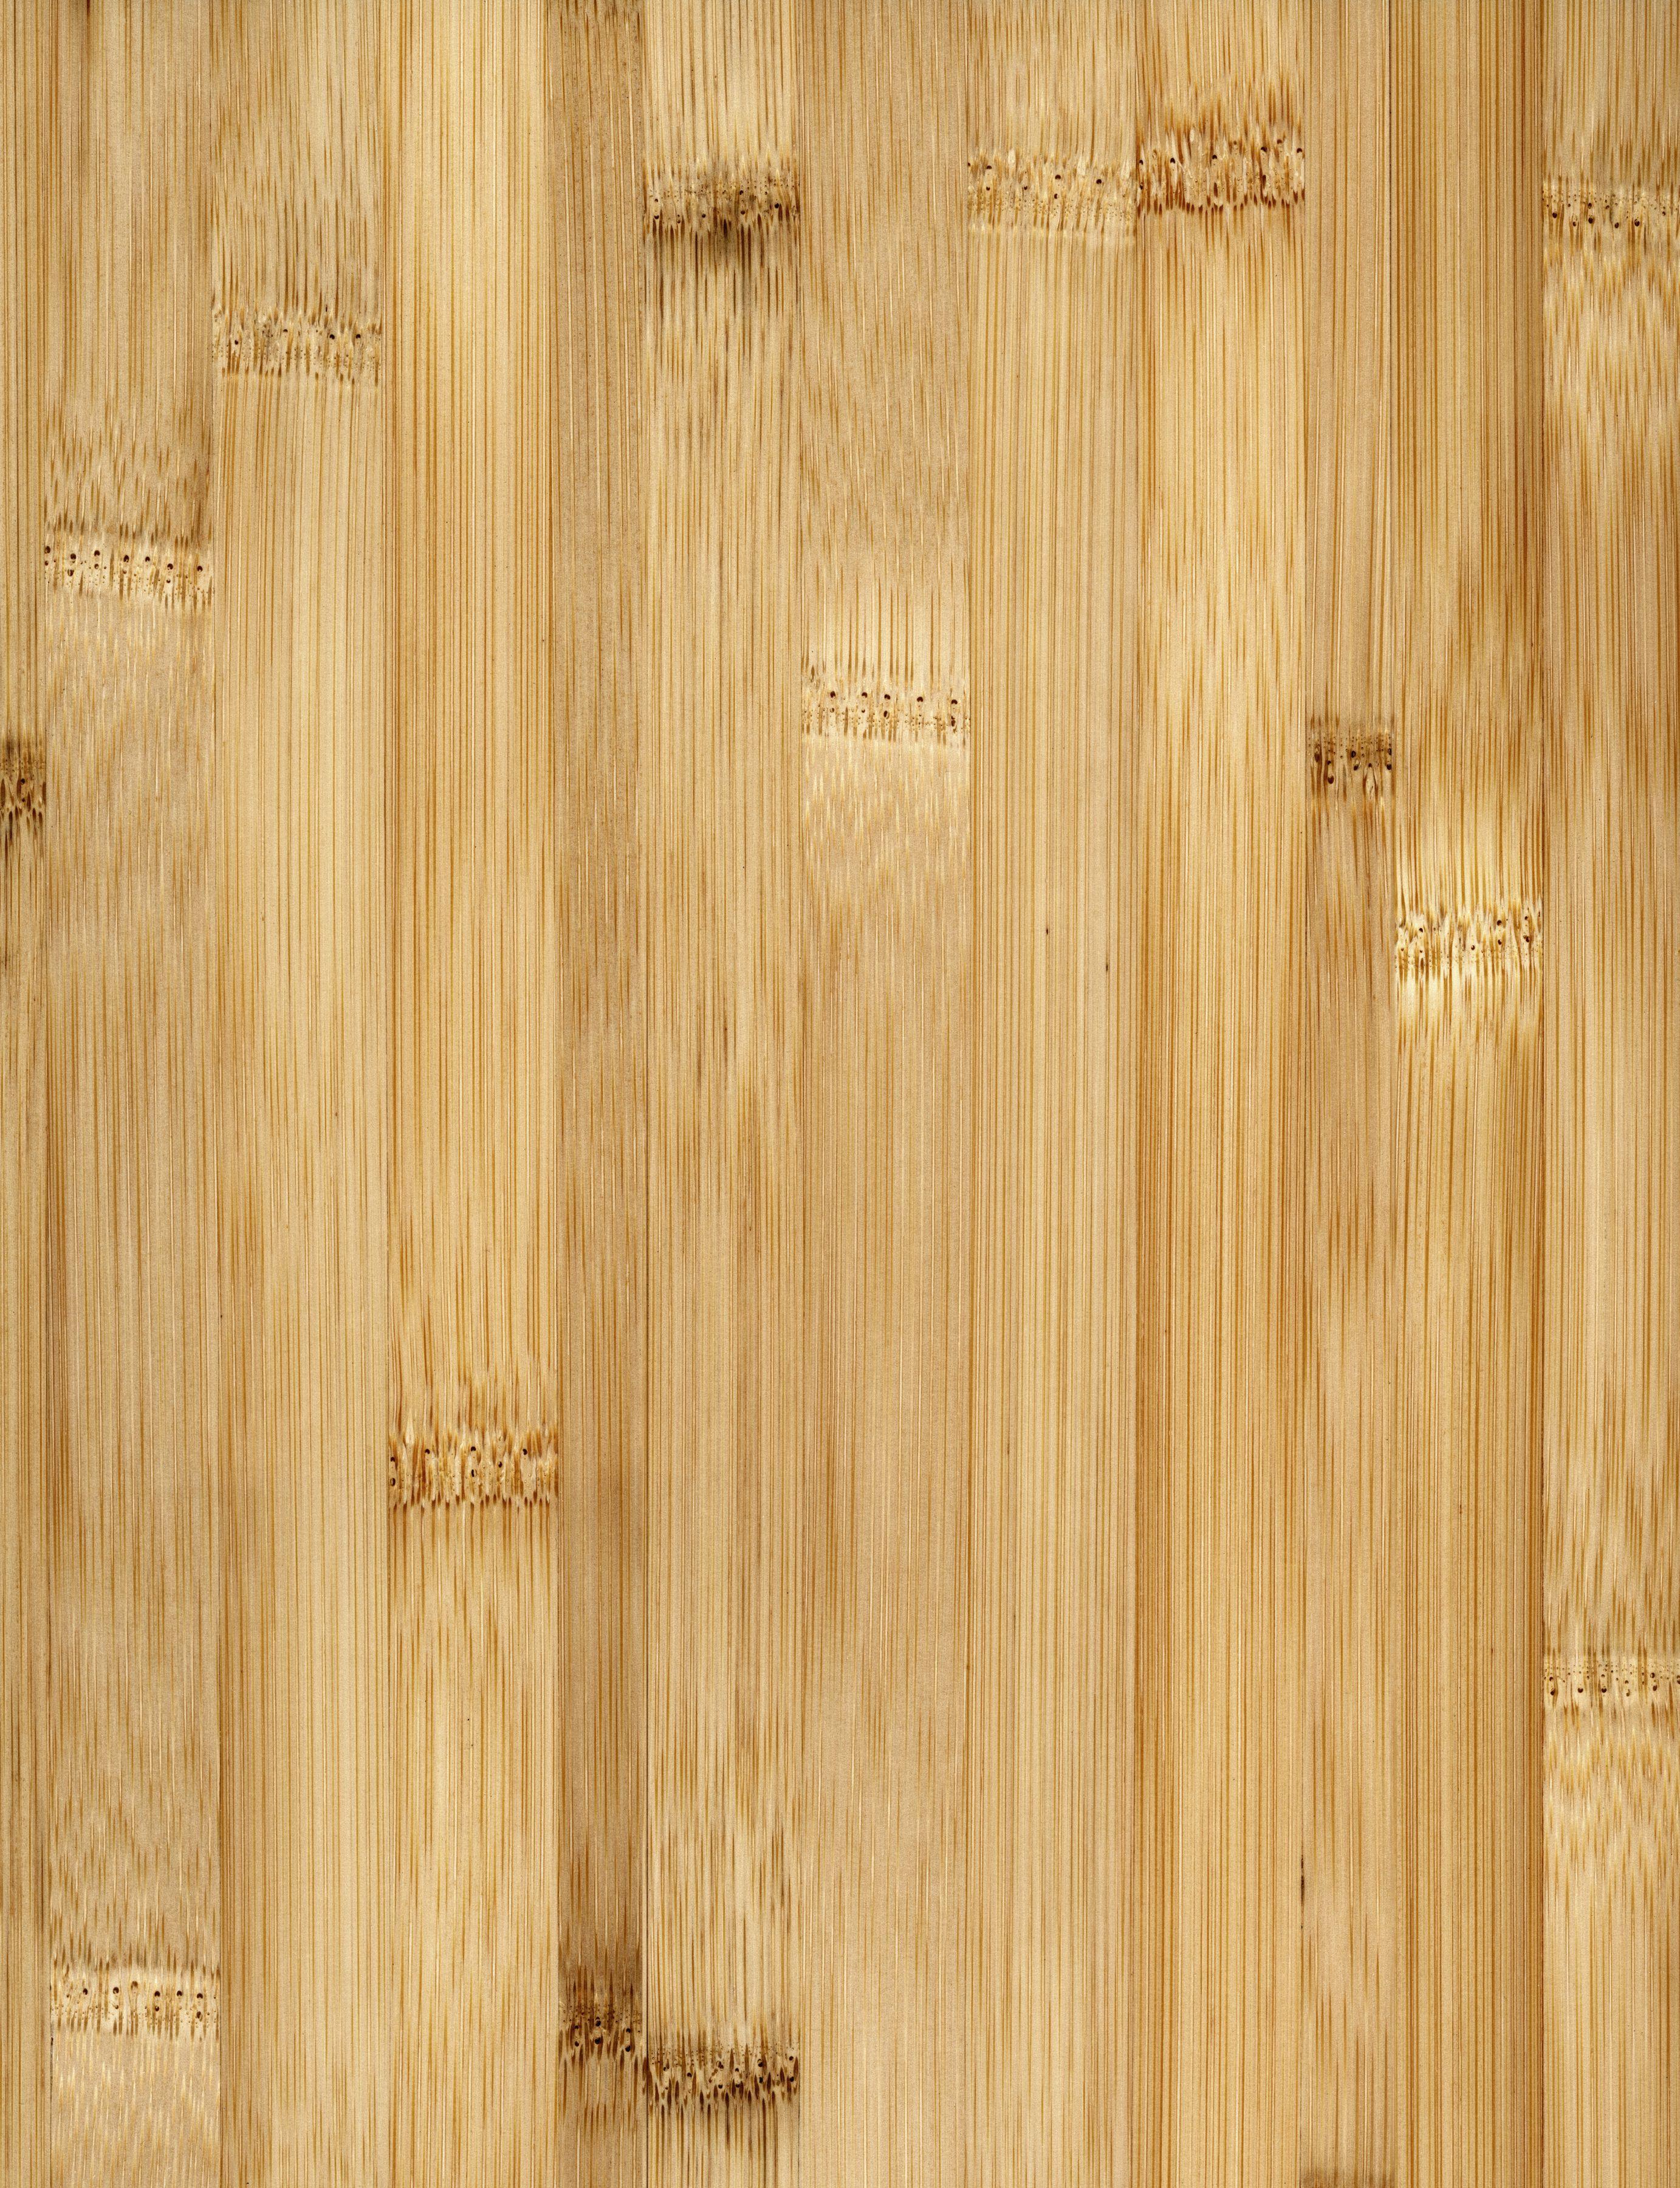 Bamboo Flooring Buying Guide